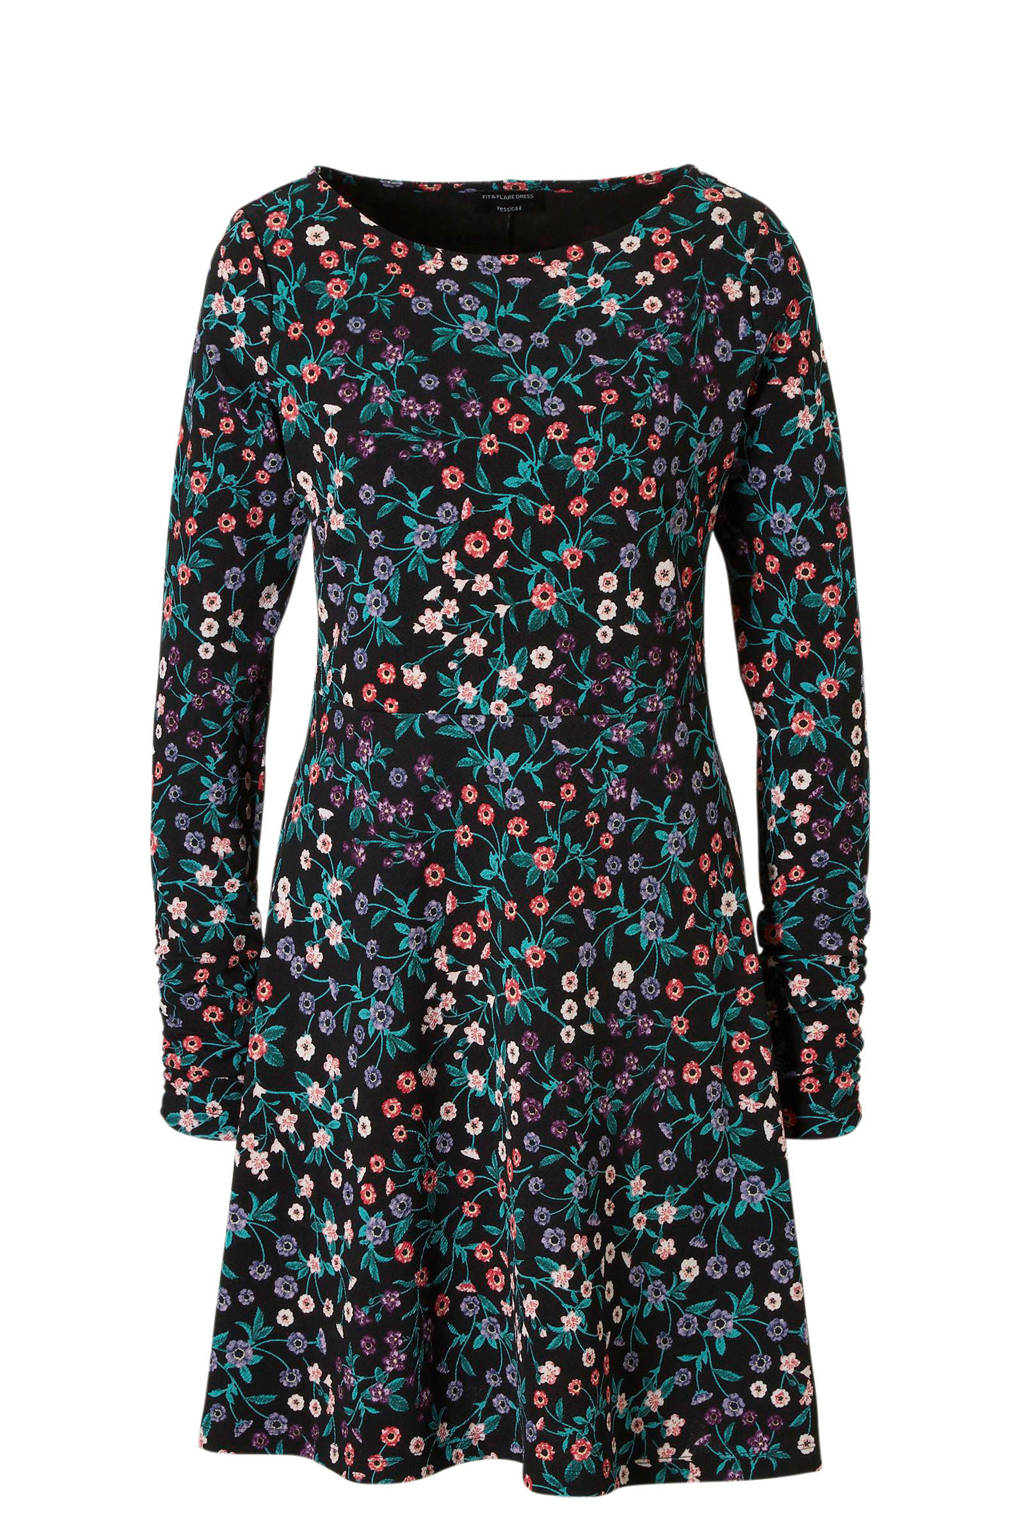 C&A Yessica jurk met all over bloemen print zwart, Zwart/ Multi-kleur